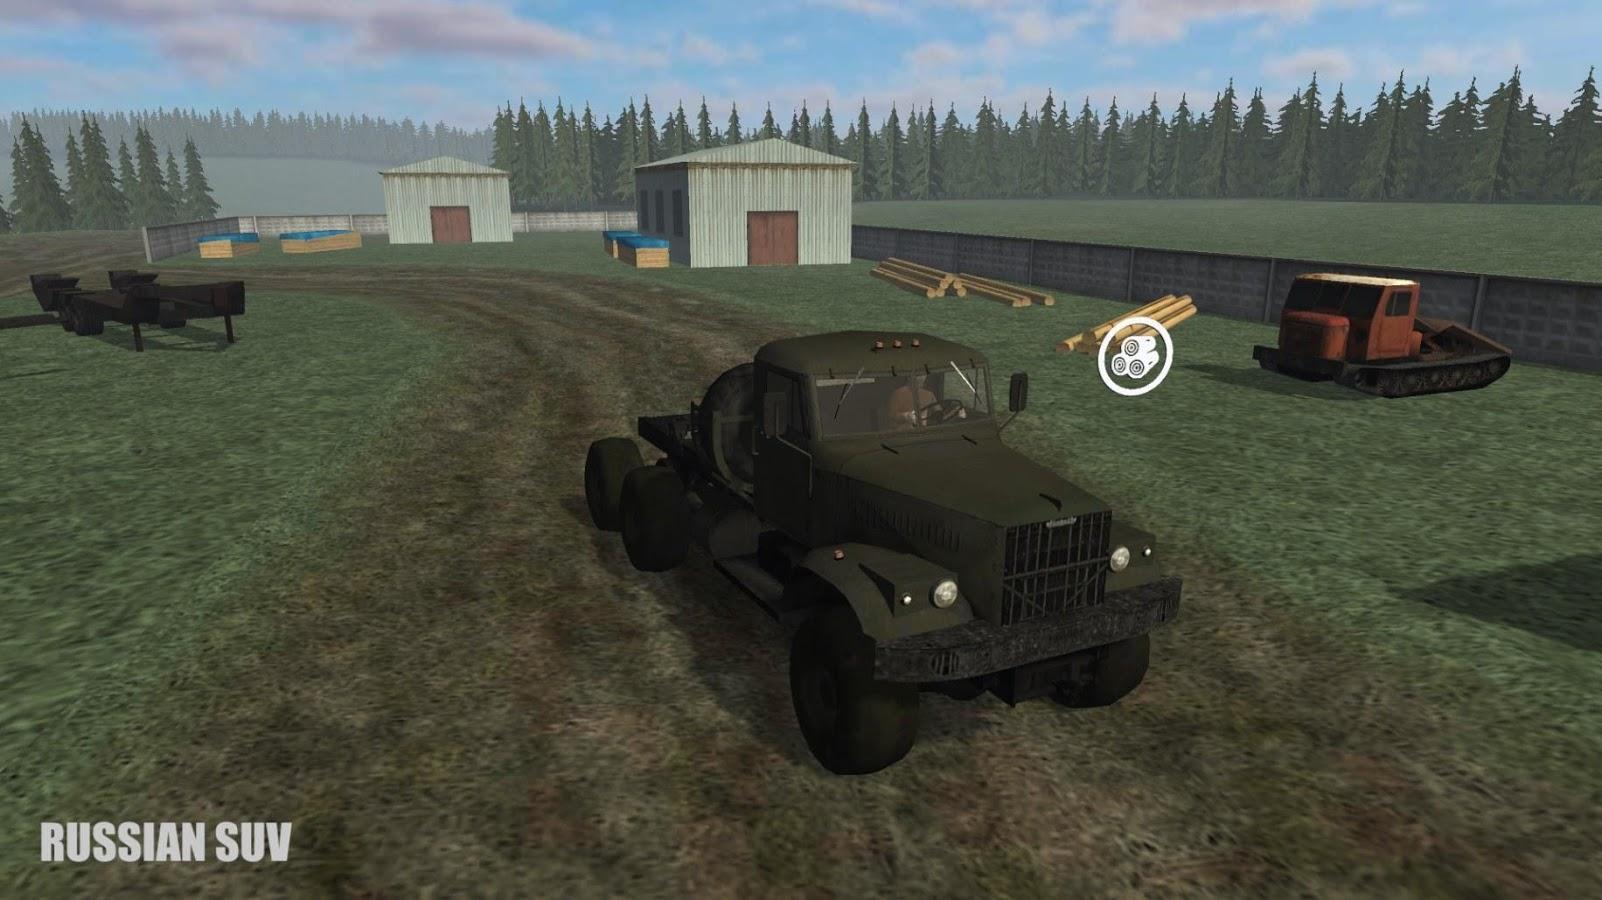 Russian SUV - androidlomka.com